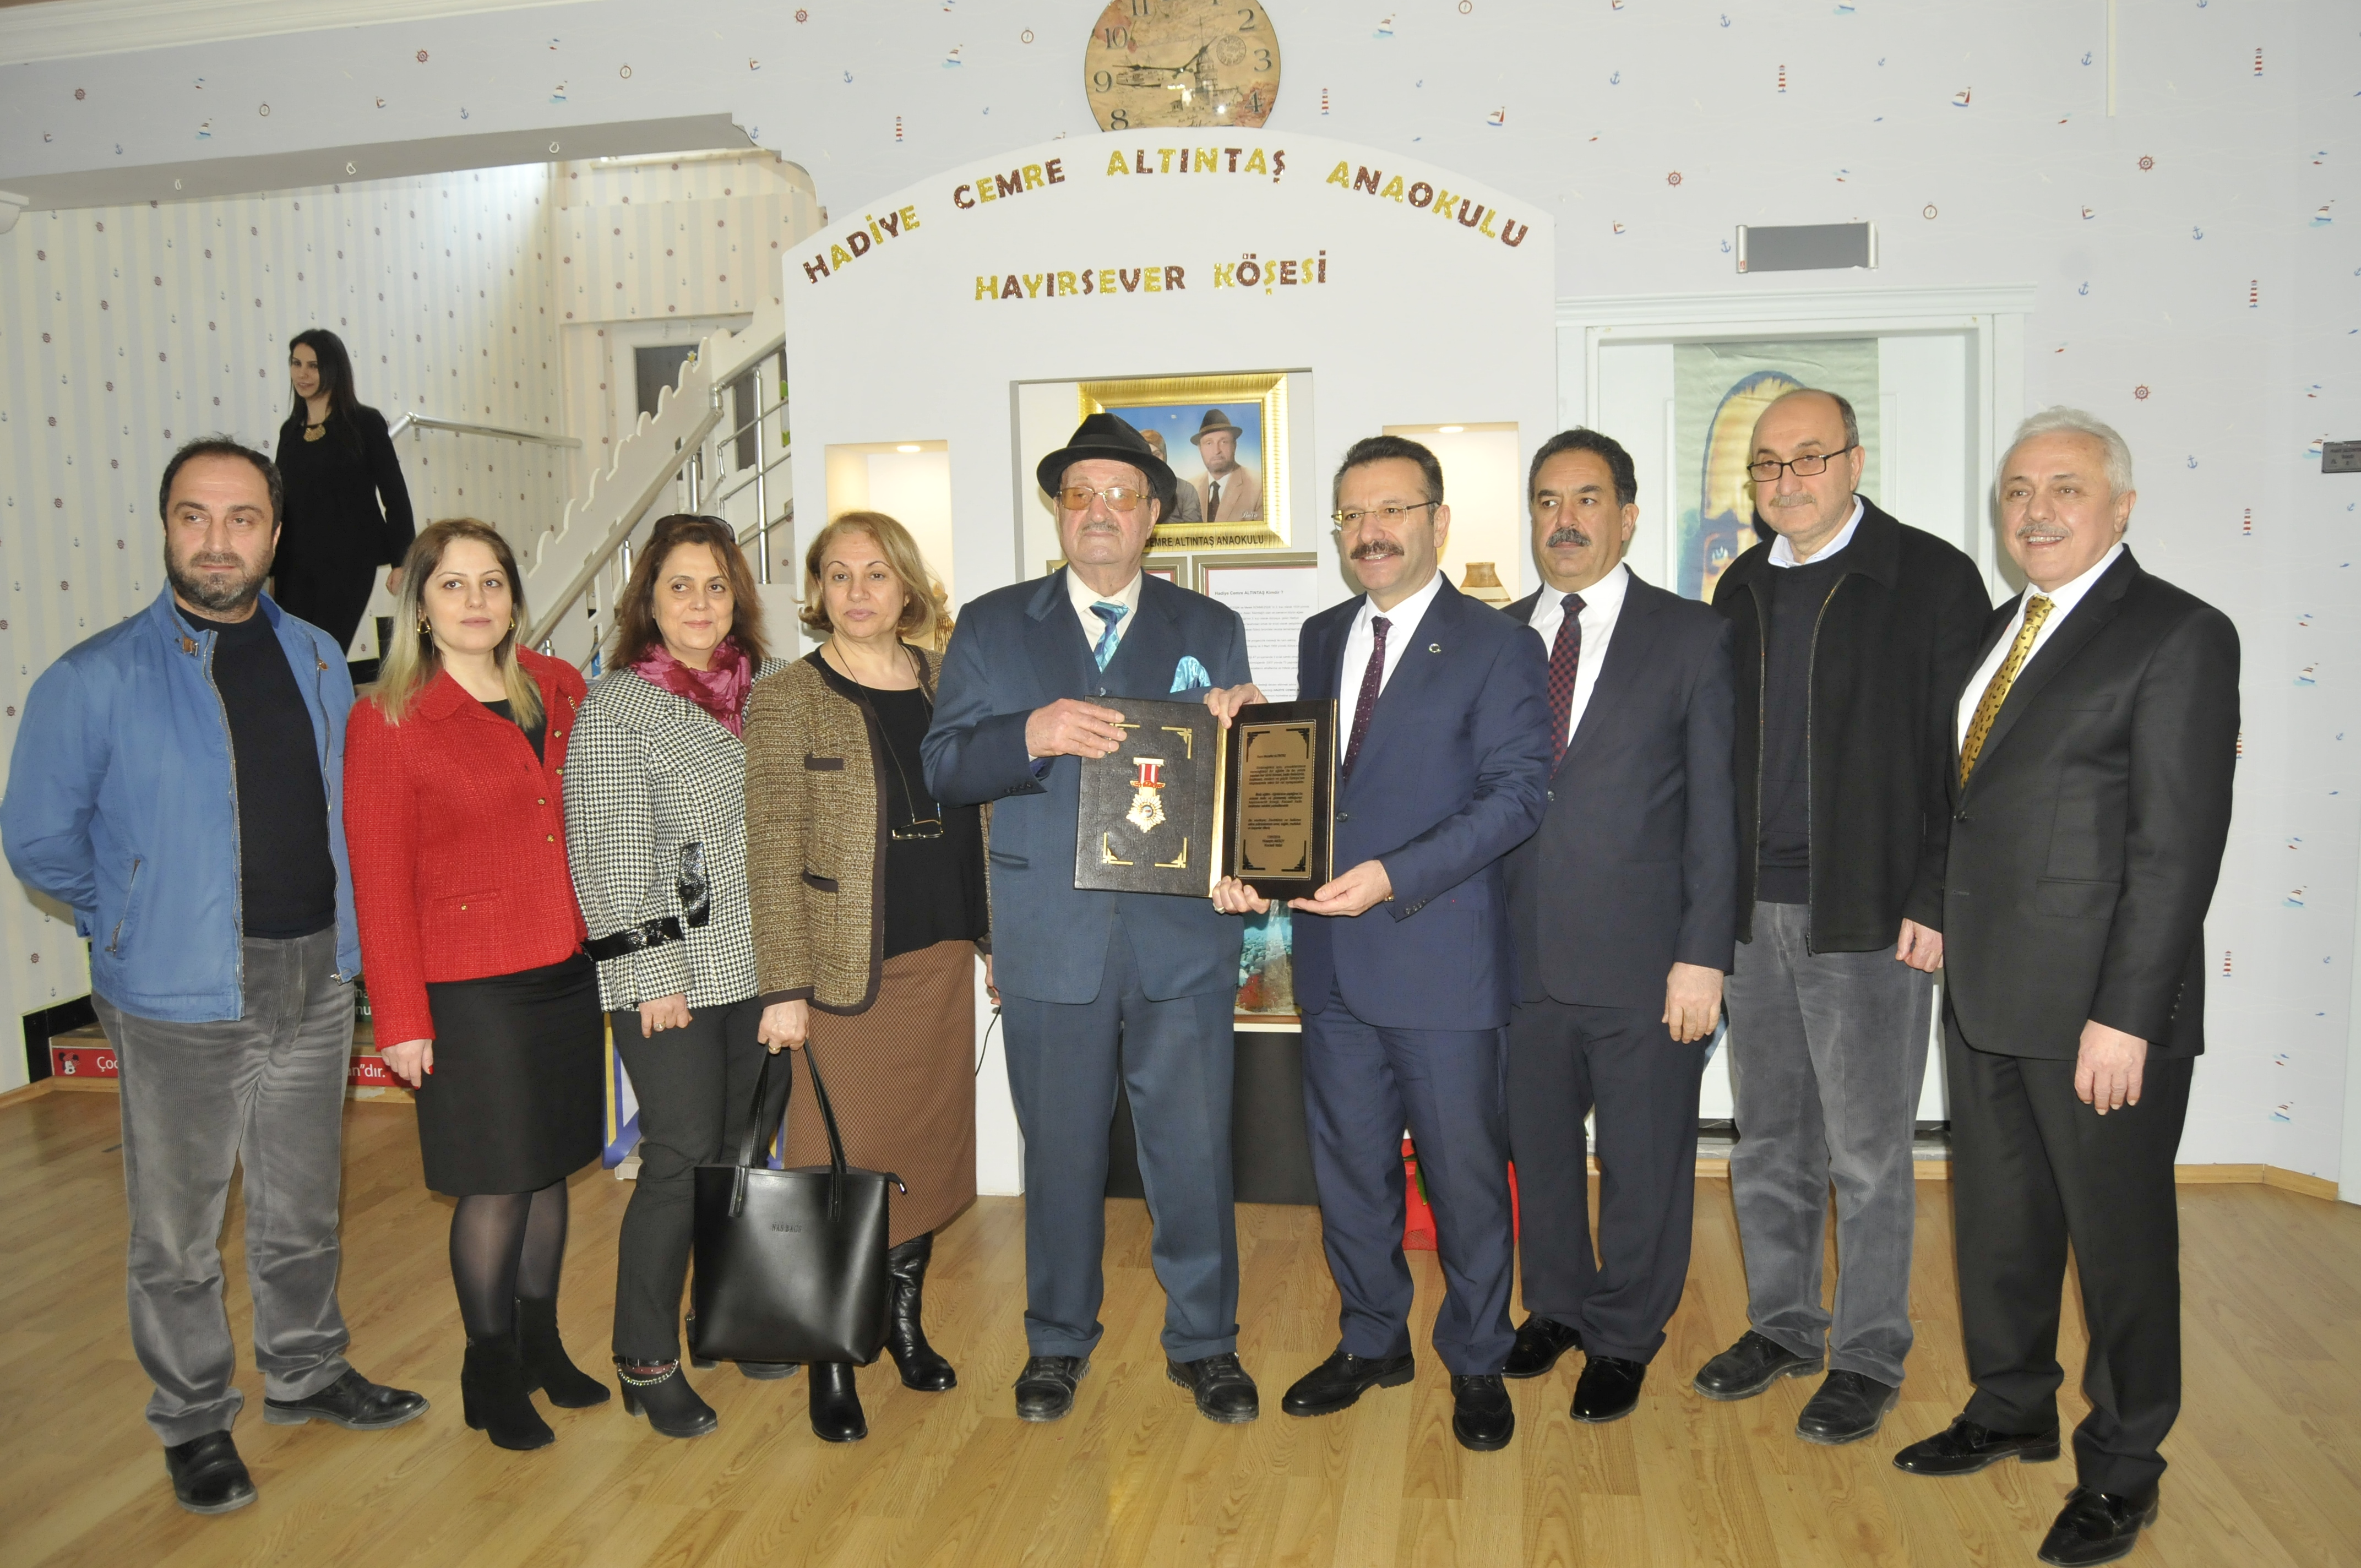 Vali Aksoy'dan Altıntaş'a teşekkür plaketi